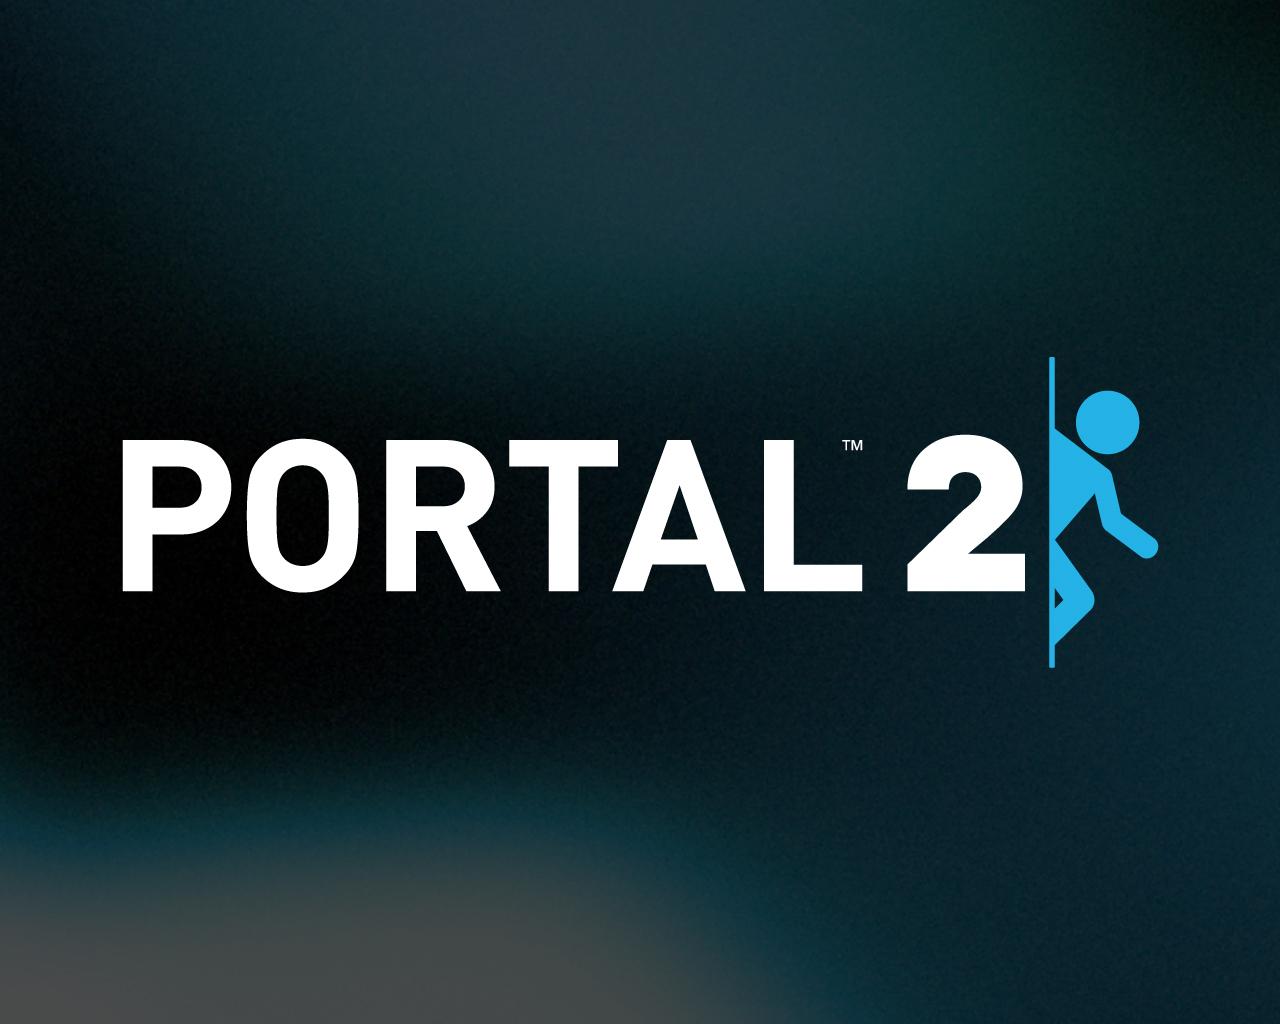 Патч (Update 2) для Portal 2 » 4Game.Ru - Фогейм ...